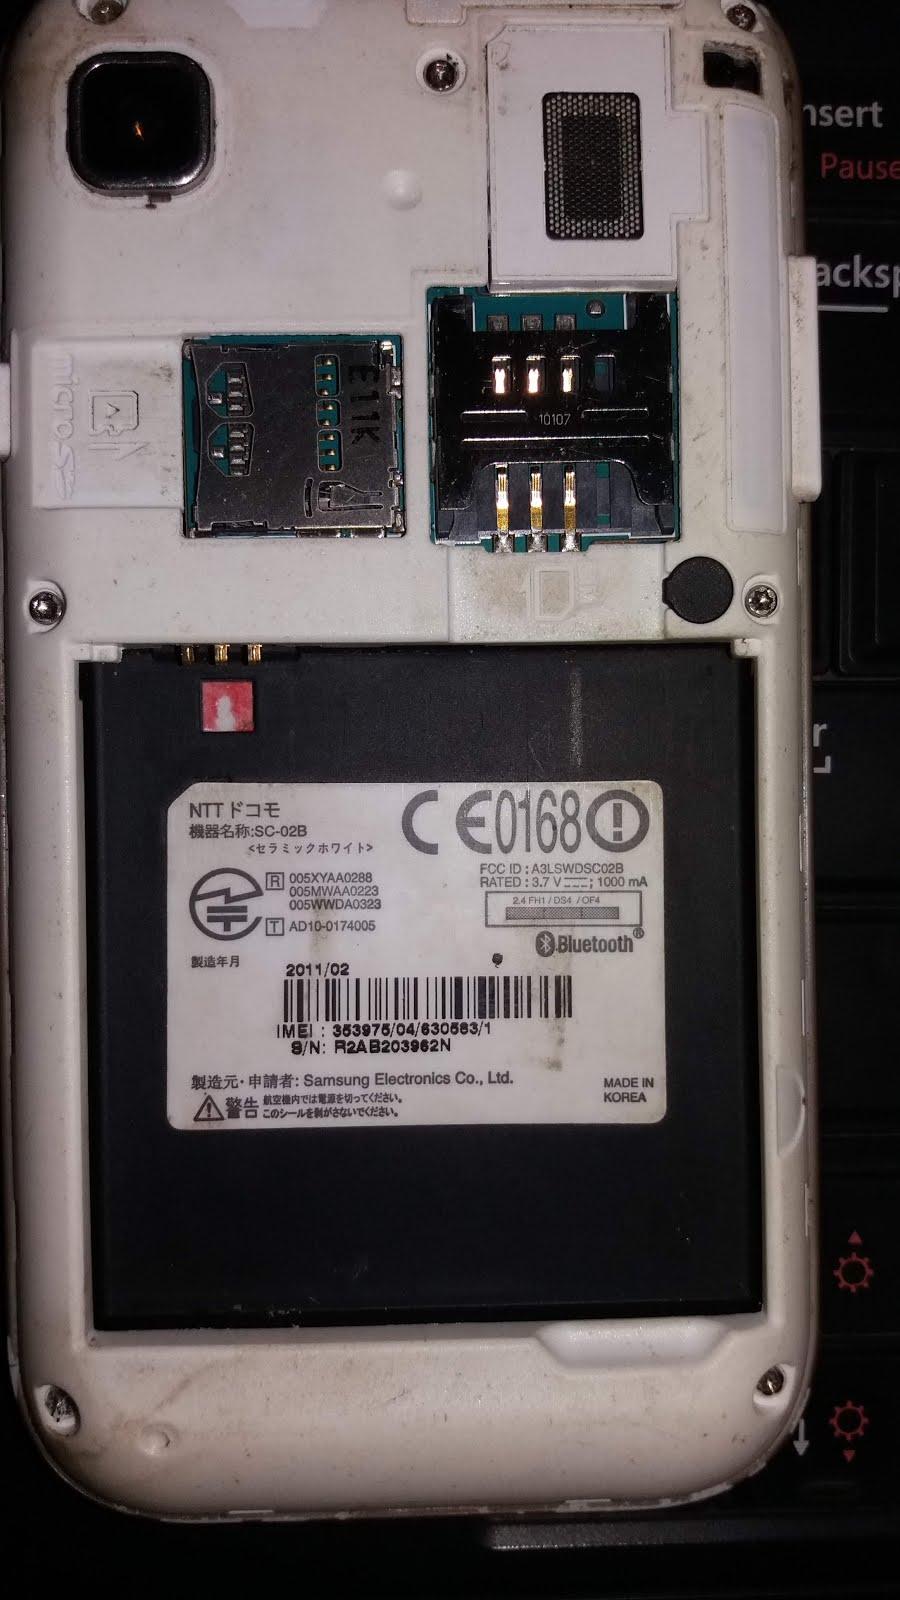 Samsung - NTT docomo - SC-02B - v2 3 6 - Firmware\Flash File